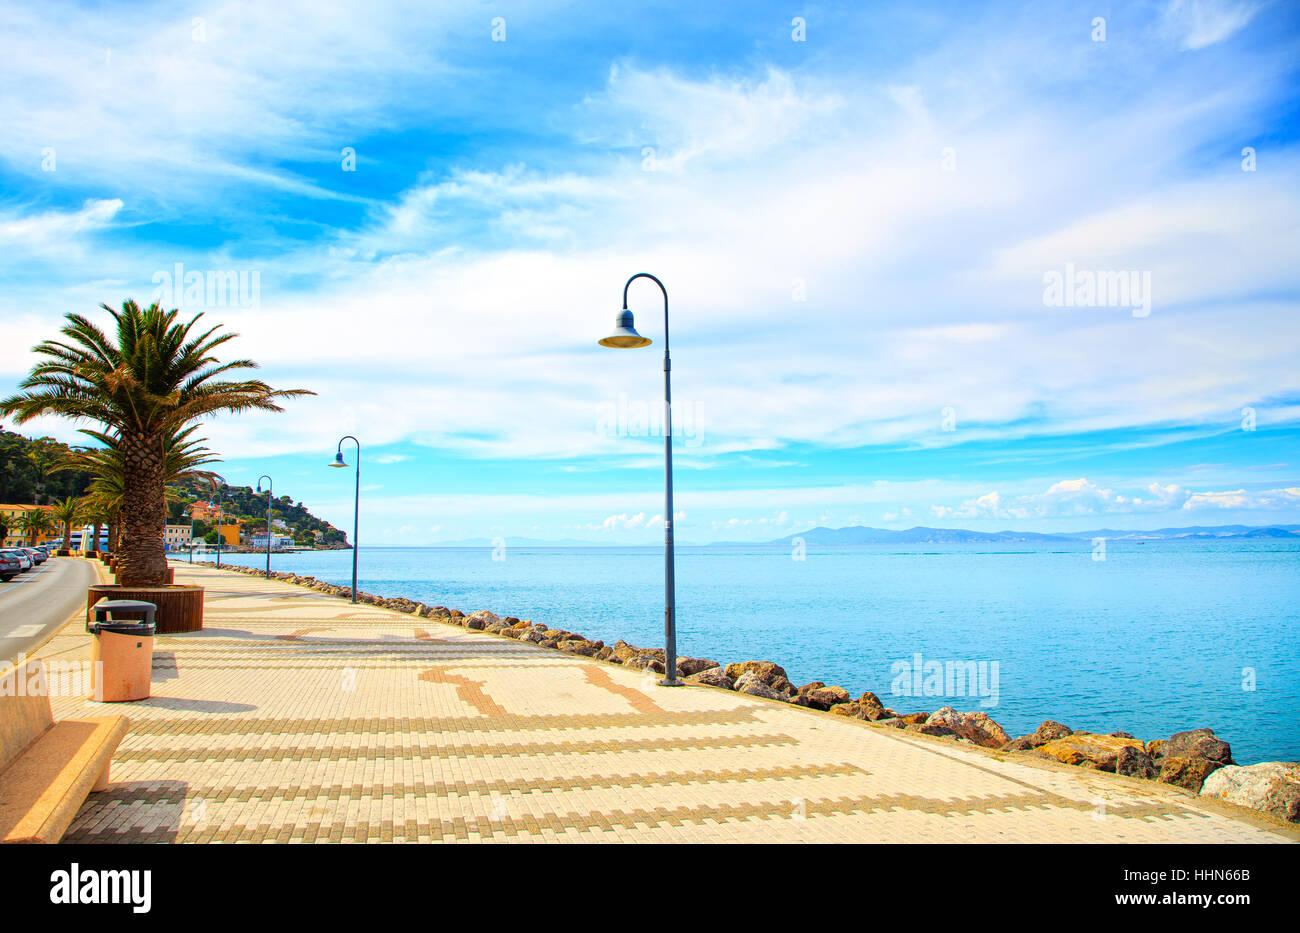 Promenade seafront or esplanade in Porto Santo Stefano harbor, Monte Argentario, Tuscany, Italy. - Stock Image